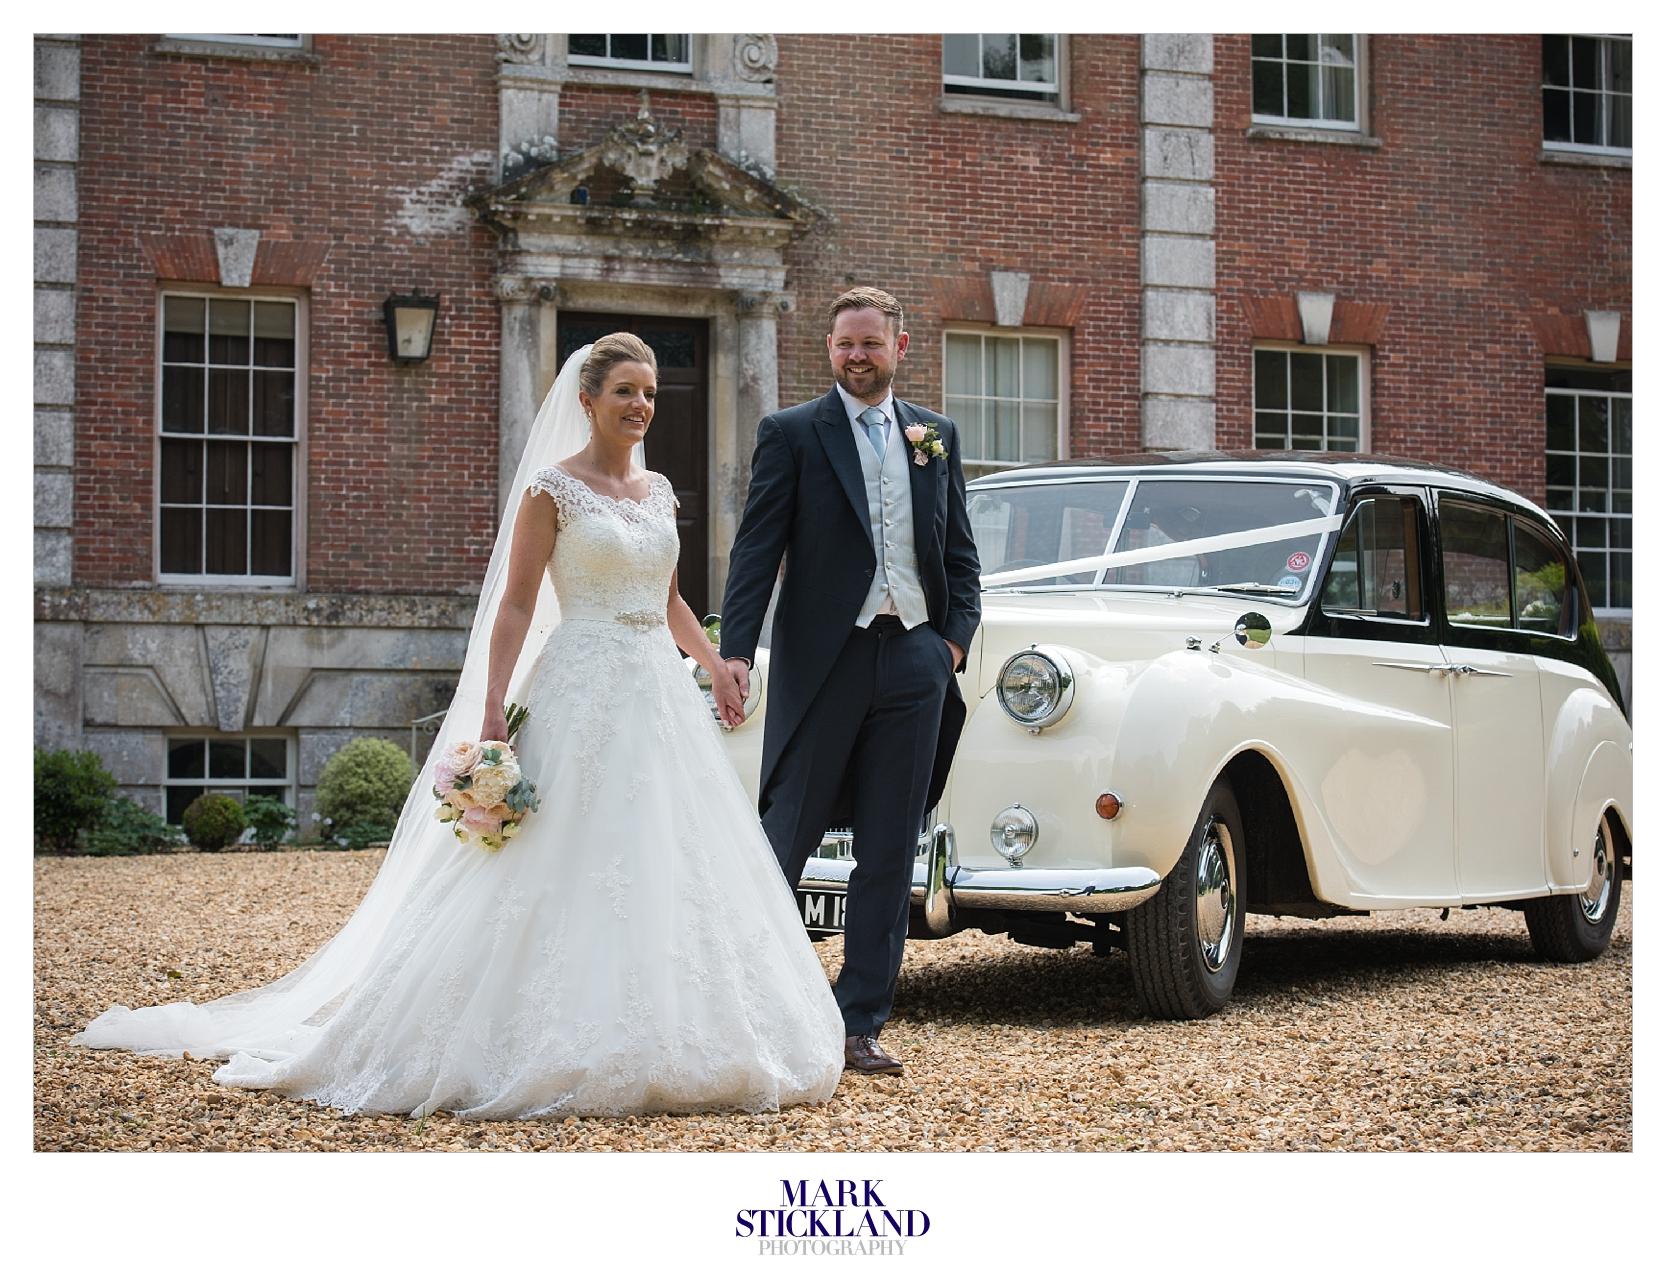 019.deans_court_wedding_wimborne_dorset